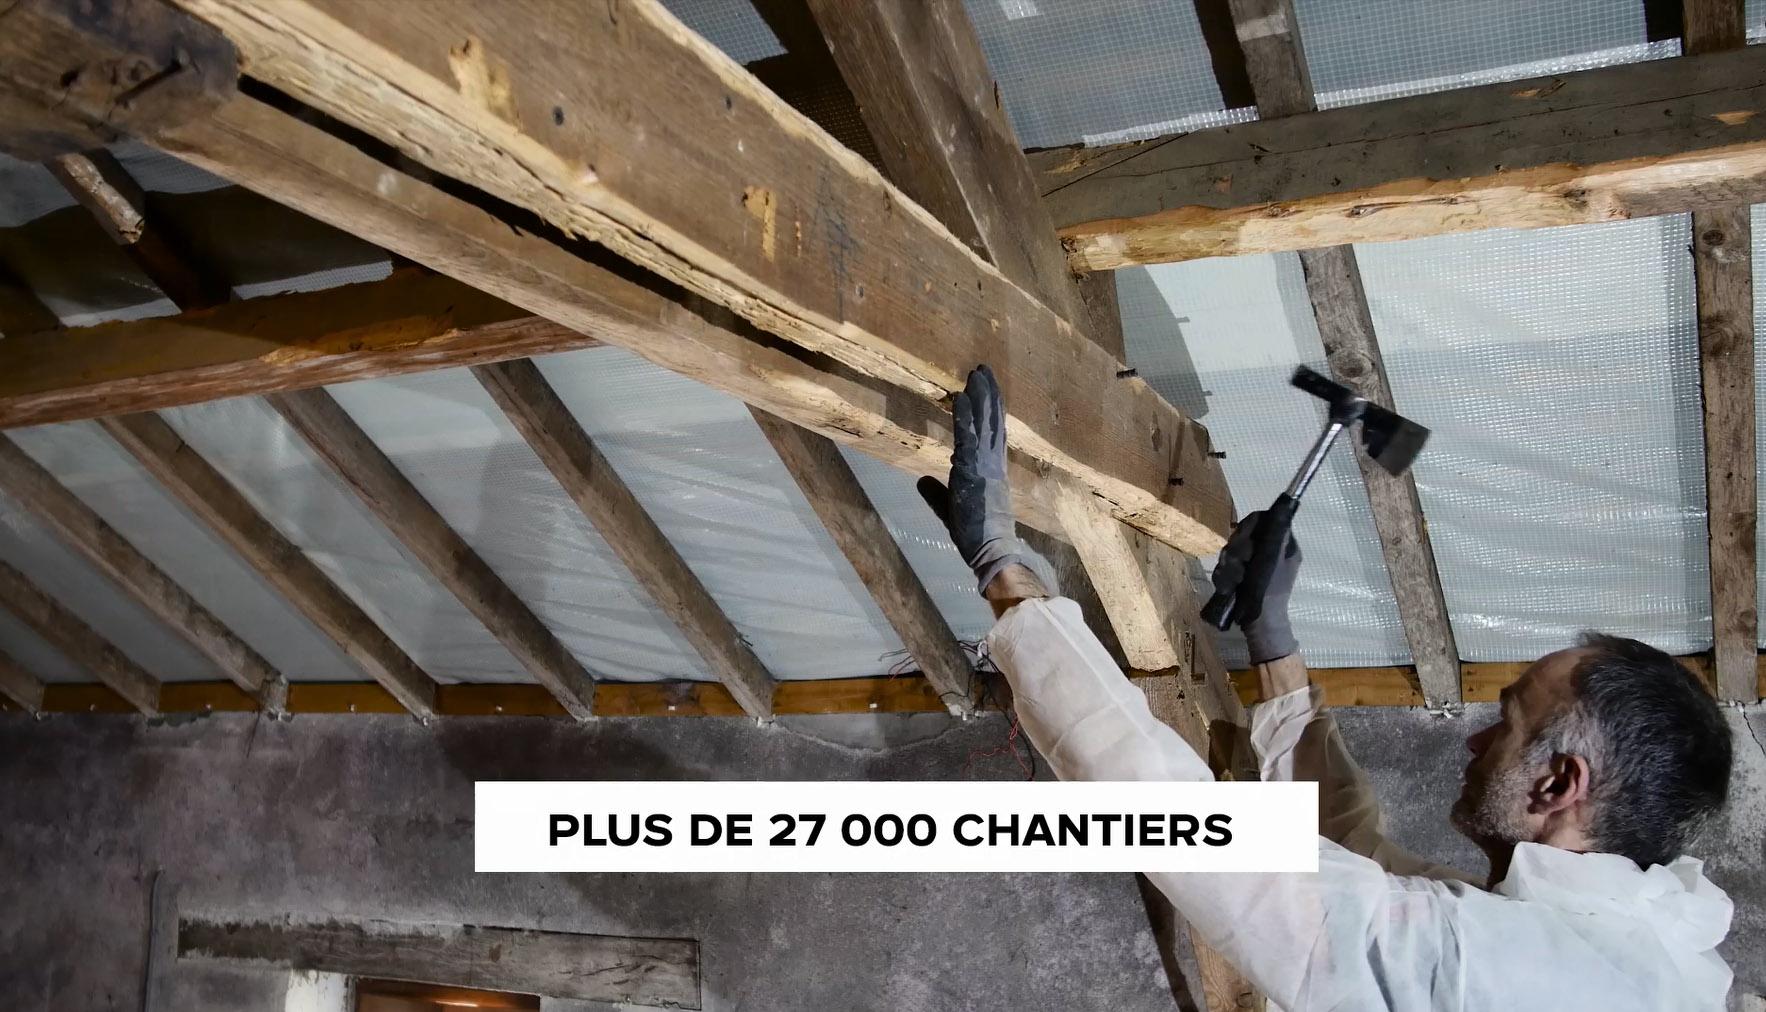 27000-chantiers